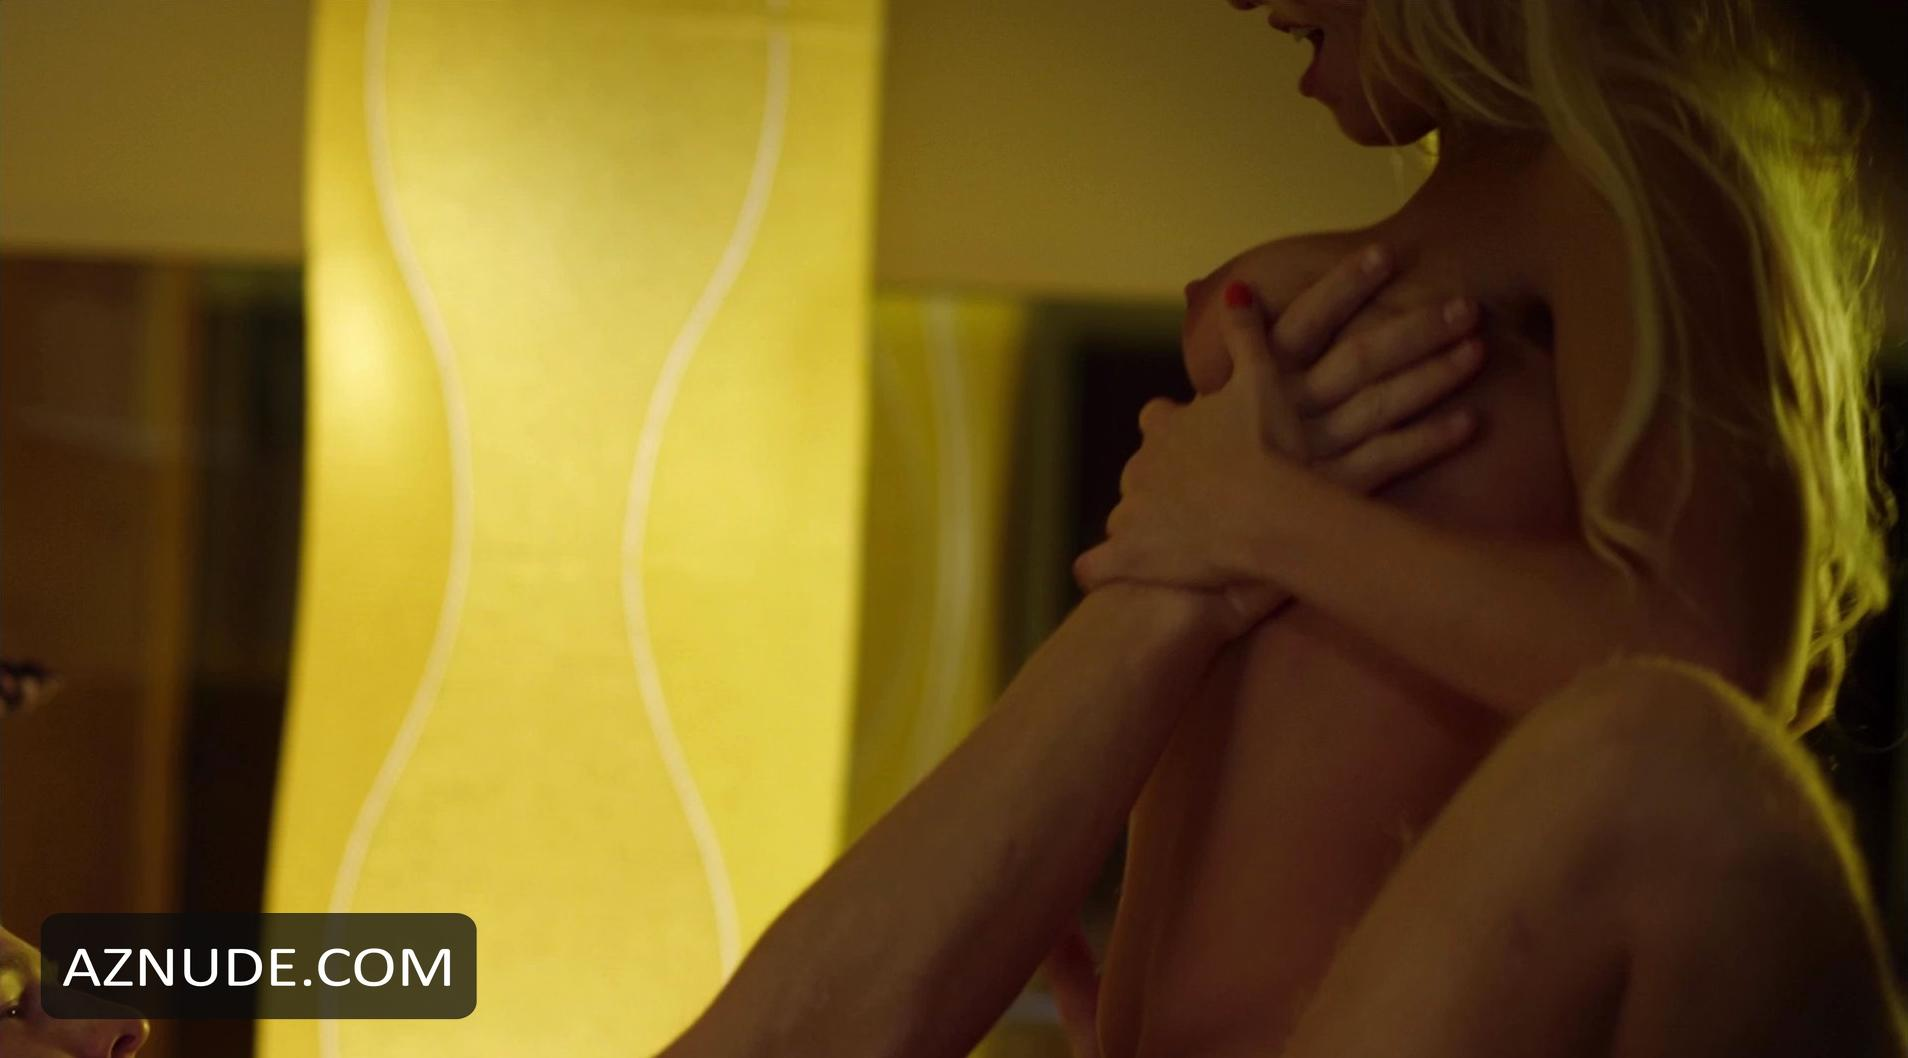 Sharon hinnendael nude embrace of the vampire 2013 - 2 part 10